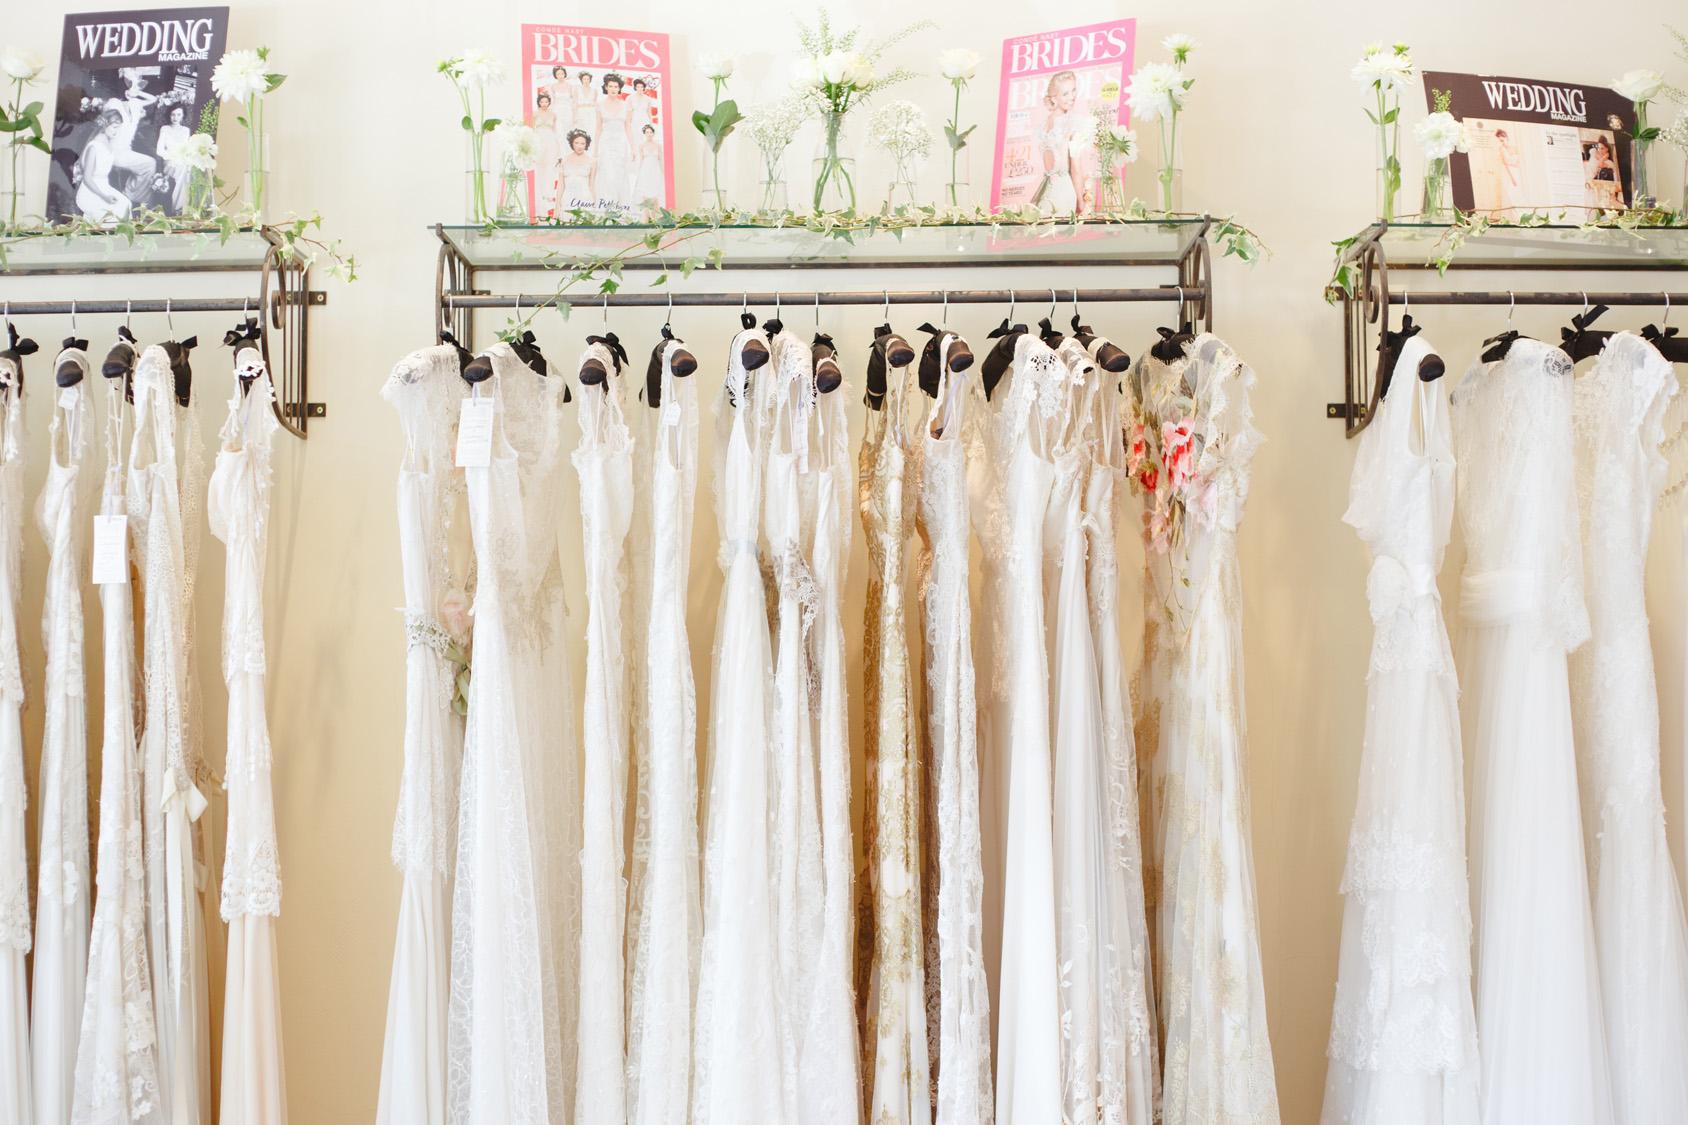 Blackburn Bridal Couture: wedding inspiration